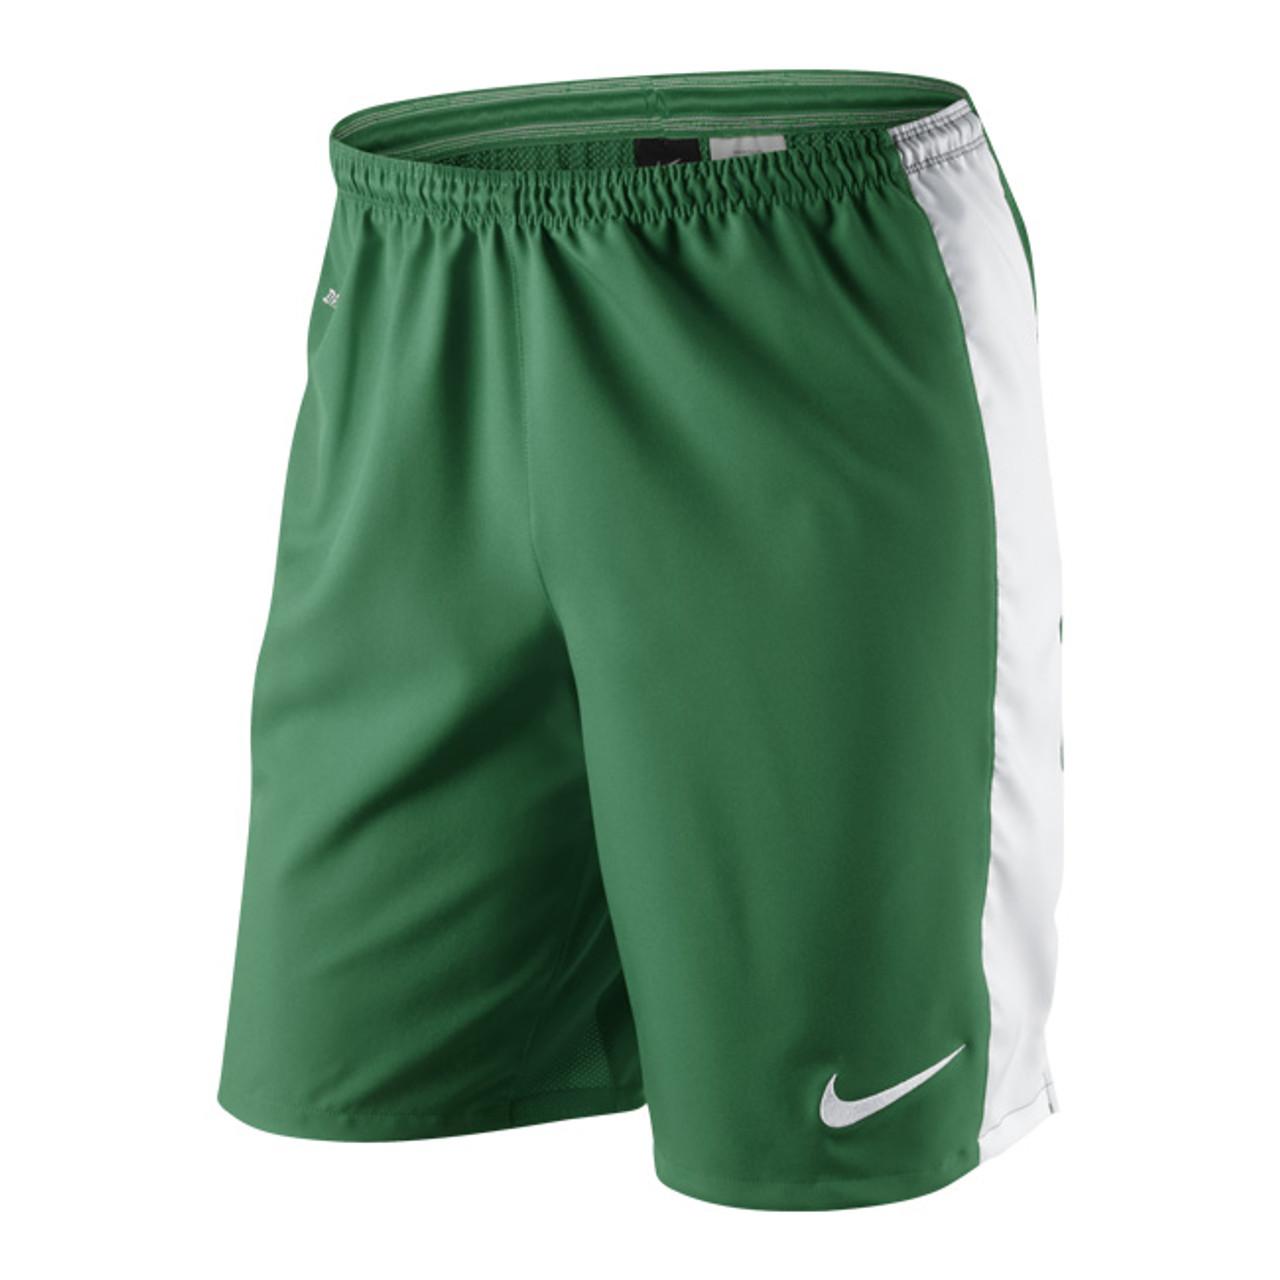 1843c3a47698c8 CLEARANCE - Nike Laser Woven Short - KIDS - Pine Green White - BigWight